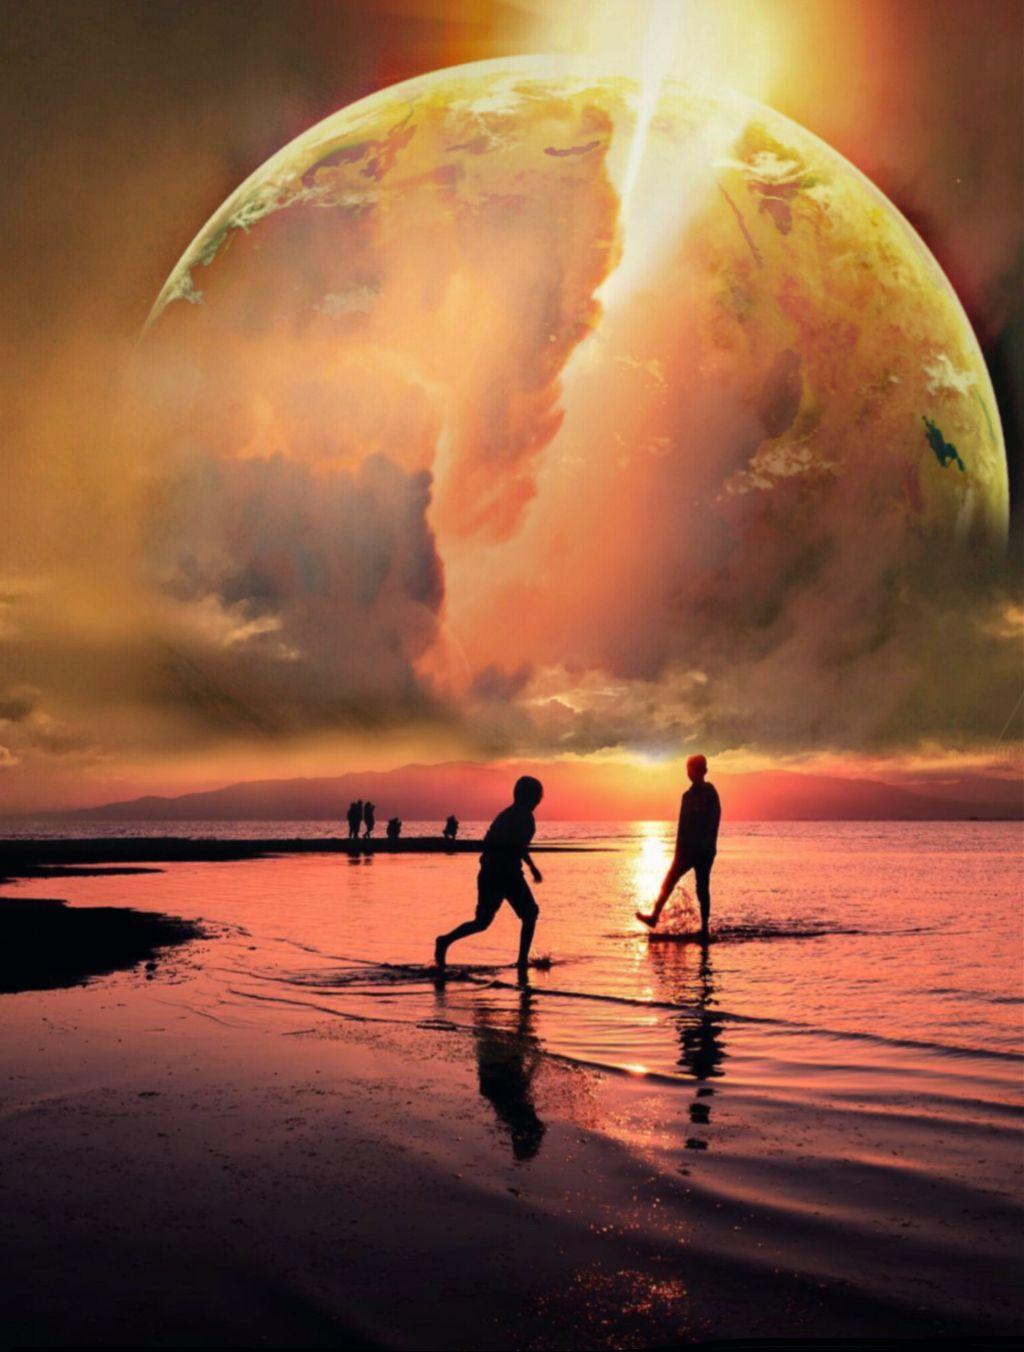 #freetoedit #myedit #edit #surreal #landscape #sunset #edited